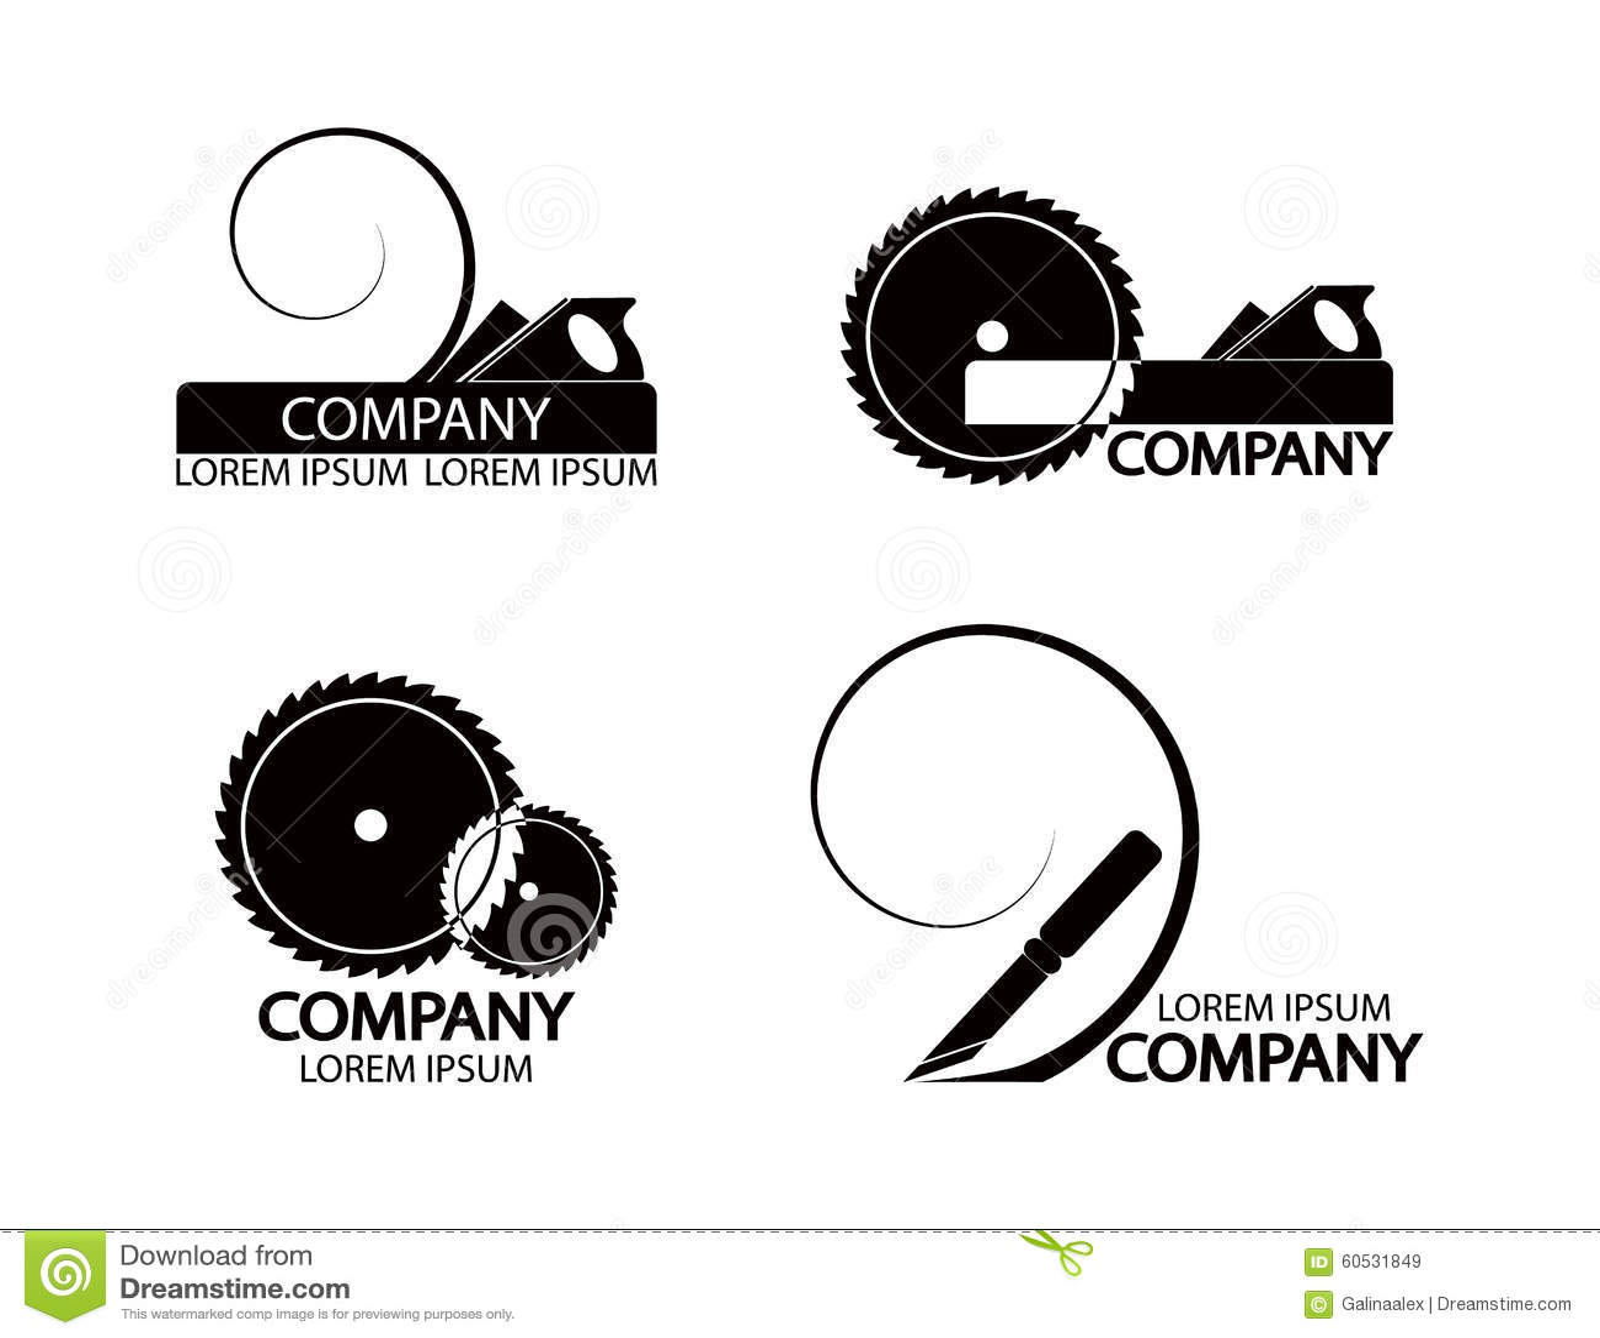 Vintage Flat Travel Logo Set: A Set Of Logos, Emblems Of Joiner's Tools. Stock Vector